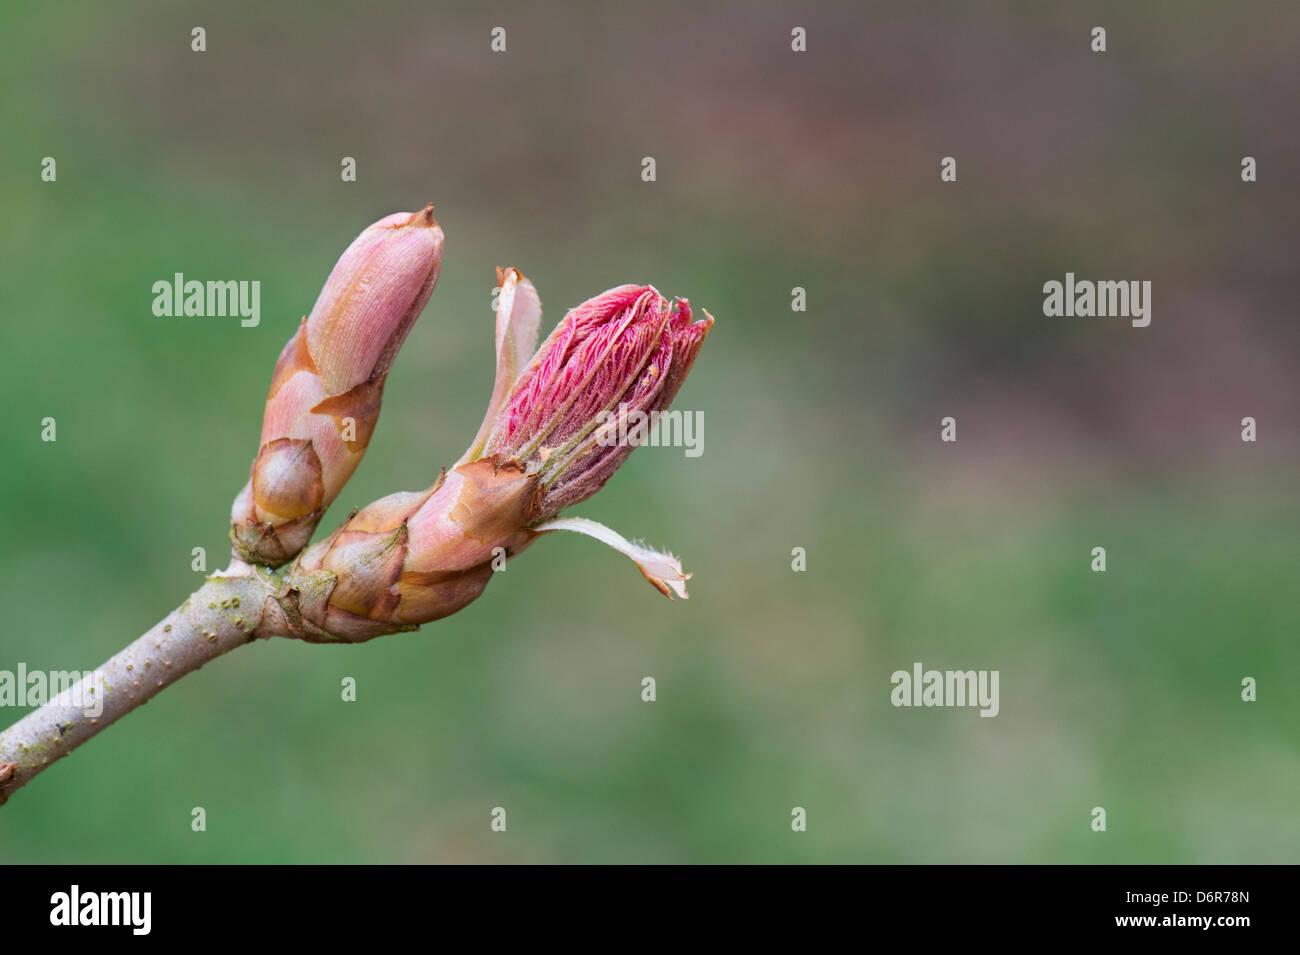 Aesculus Neglecta 'Erythroblastos'. Sunrise horse chestnut leaf bud opening in spring Stock Photo